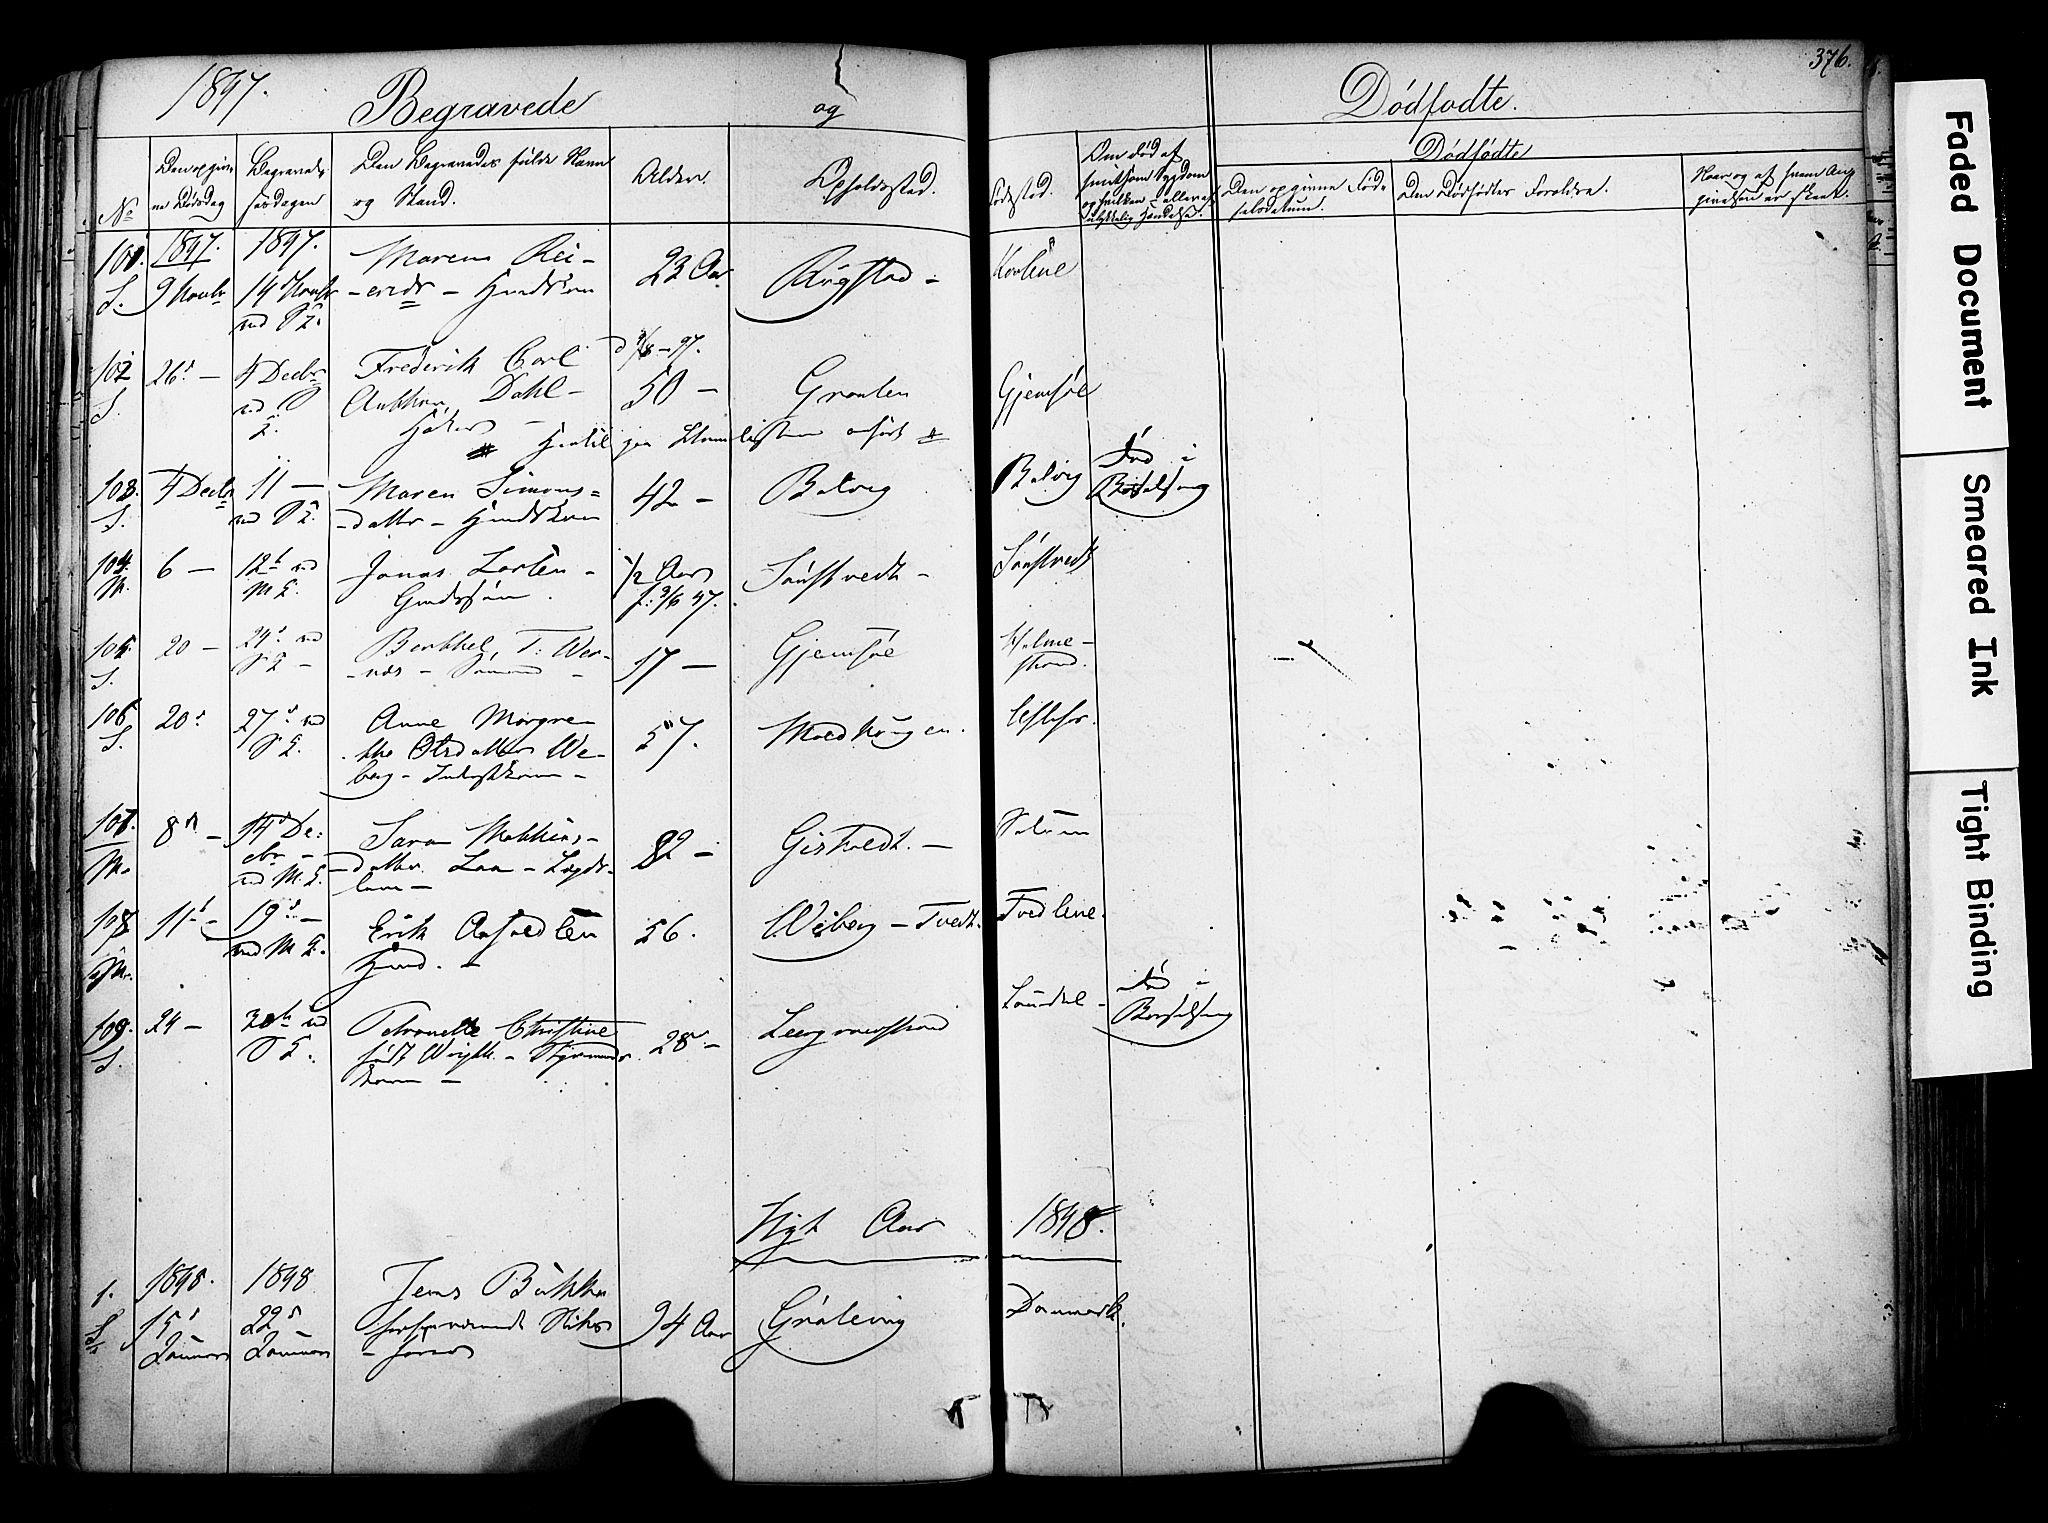 SAKO, Solum kirkebøker, F/Fa/L0006: Ministerialbok nr. I 6, 1844-1855, s. 376